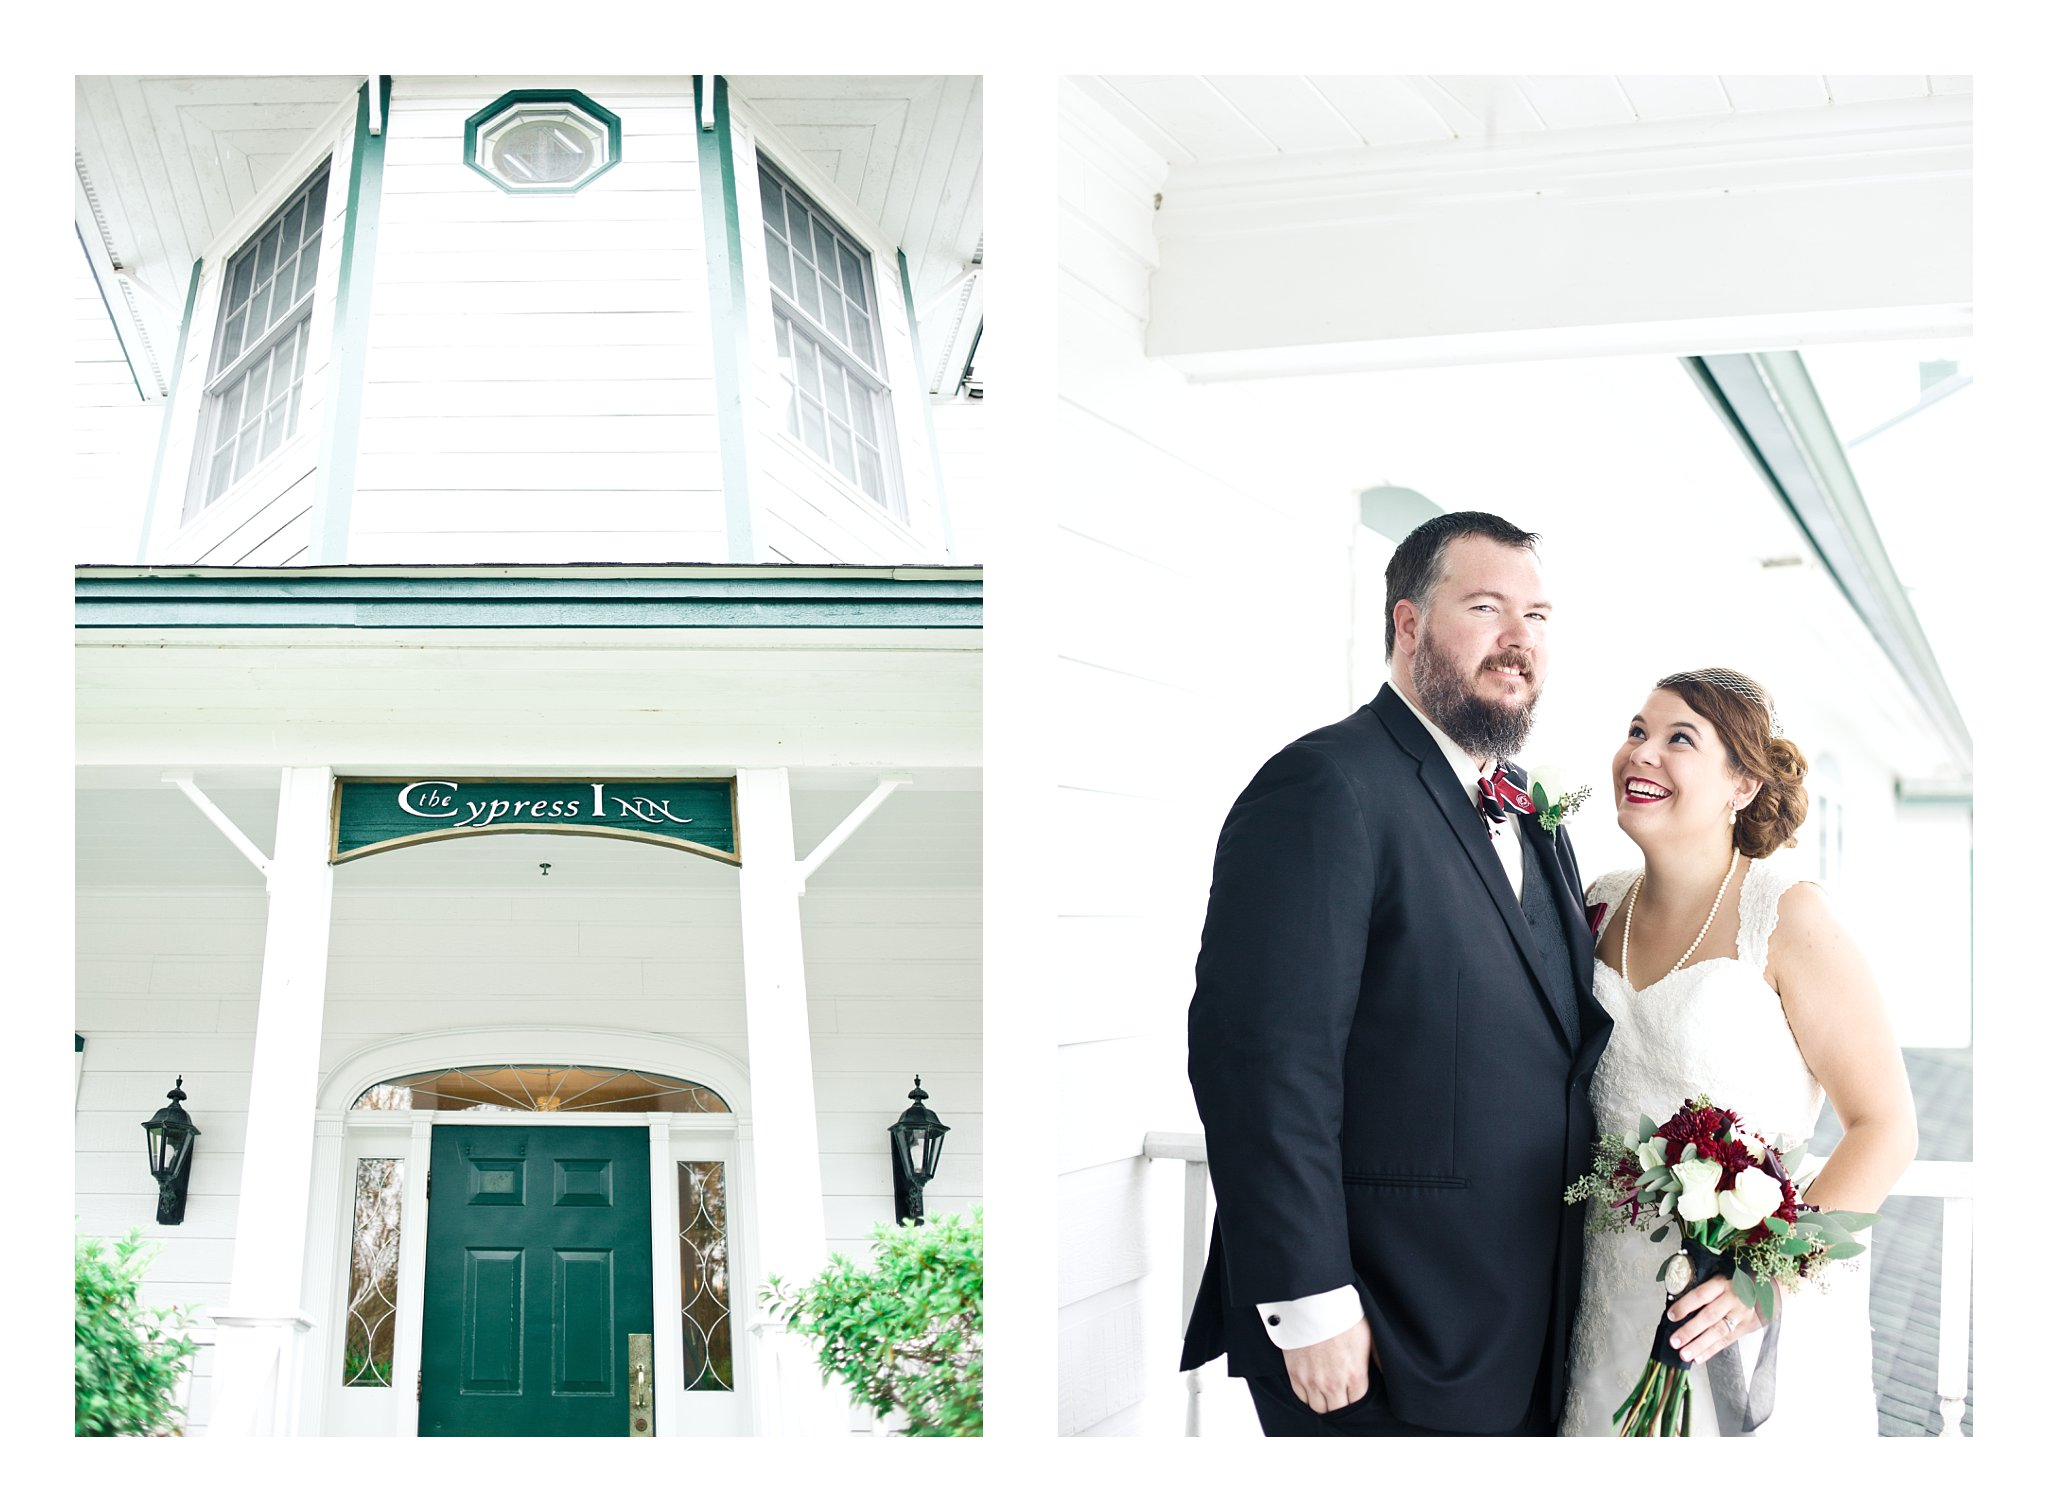 cypress-inn-garnet-black-lowcountry-vintage-wedding-conway-sc-photos_0117.jpg